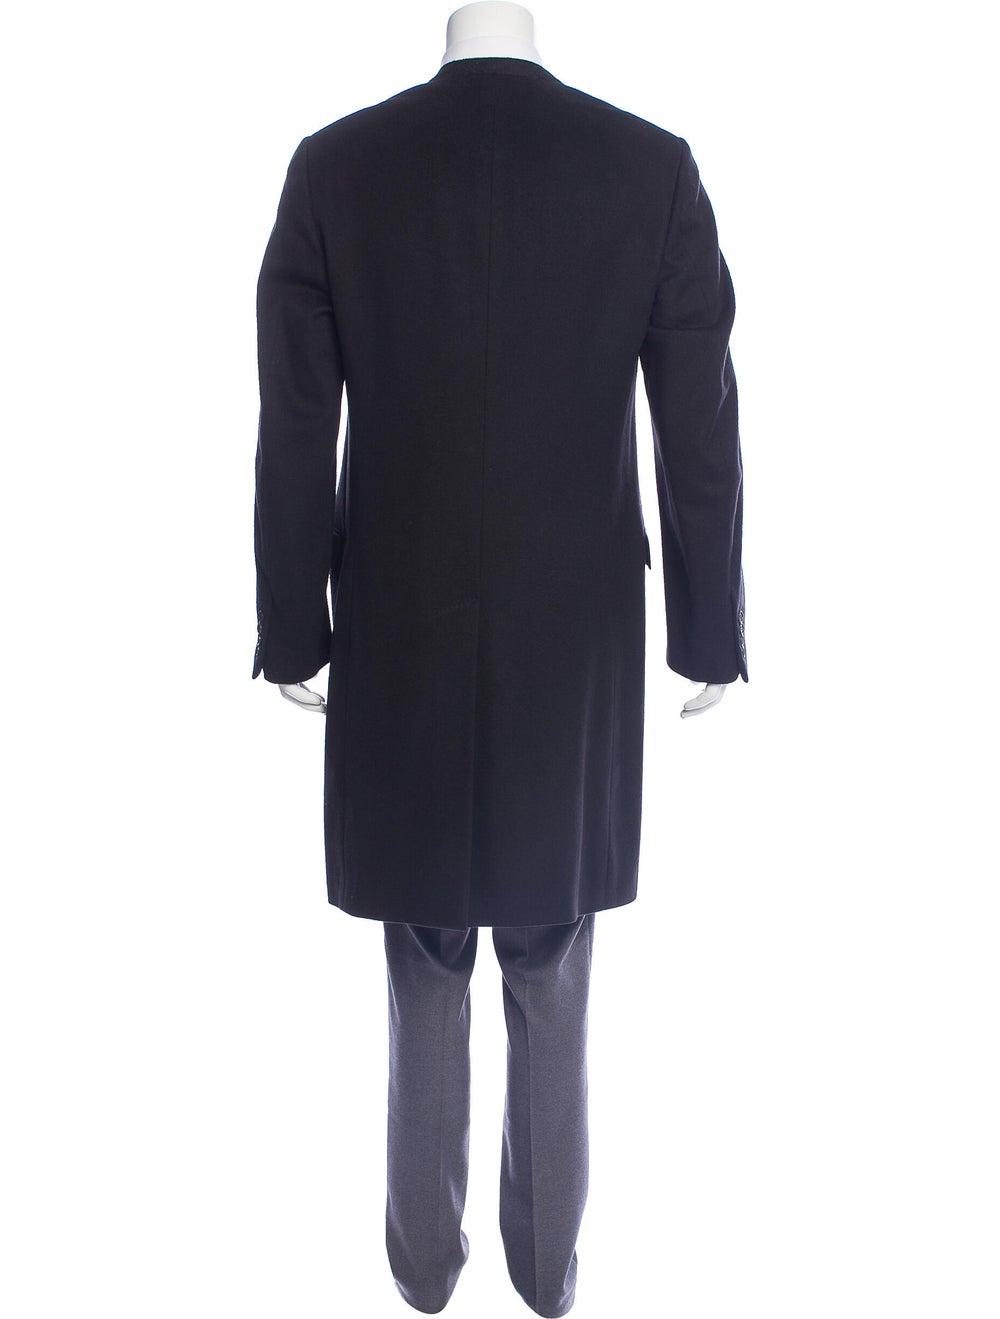 Lanvin Wool-Blend Overcoat black - image 3